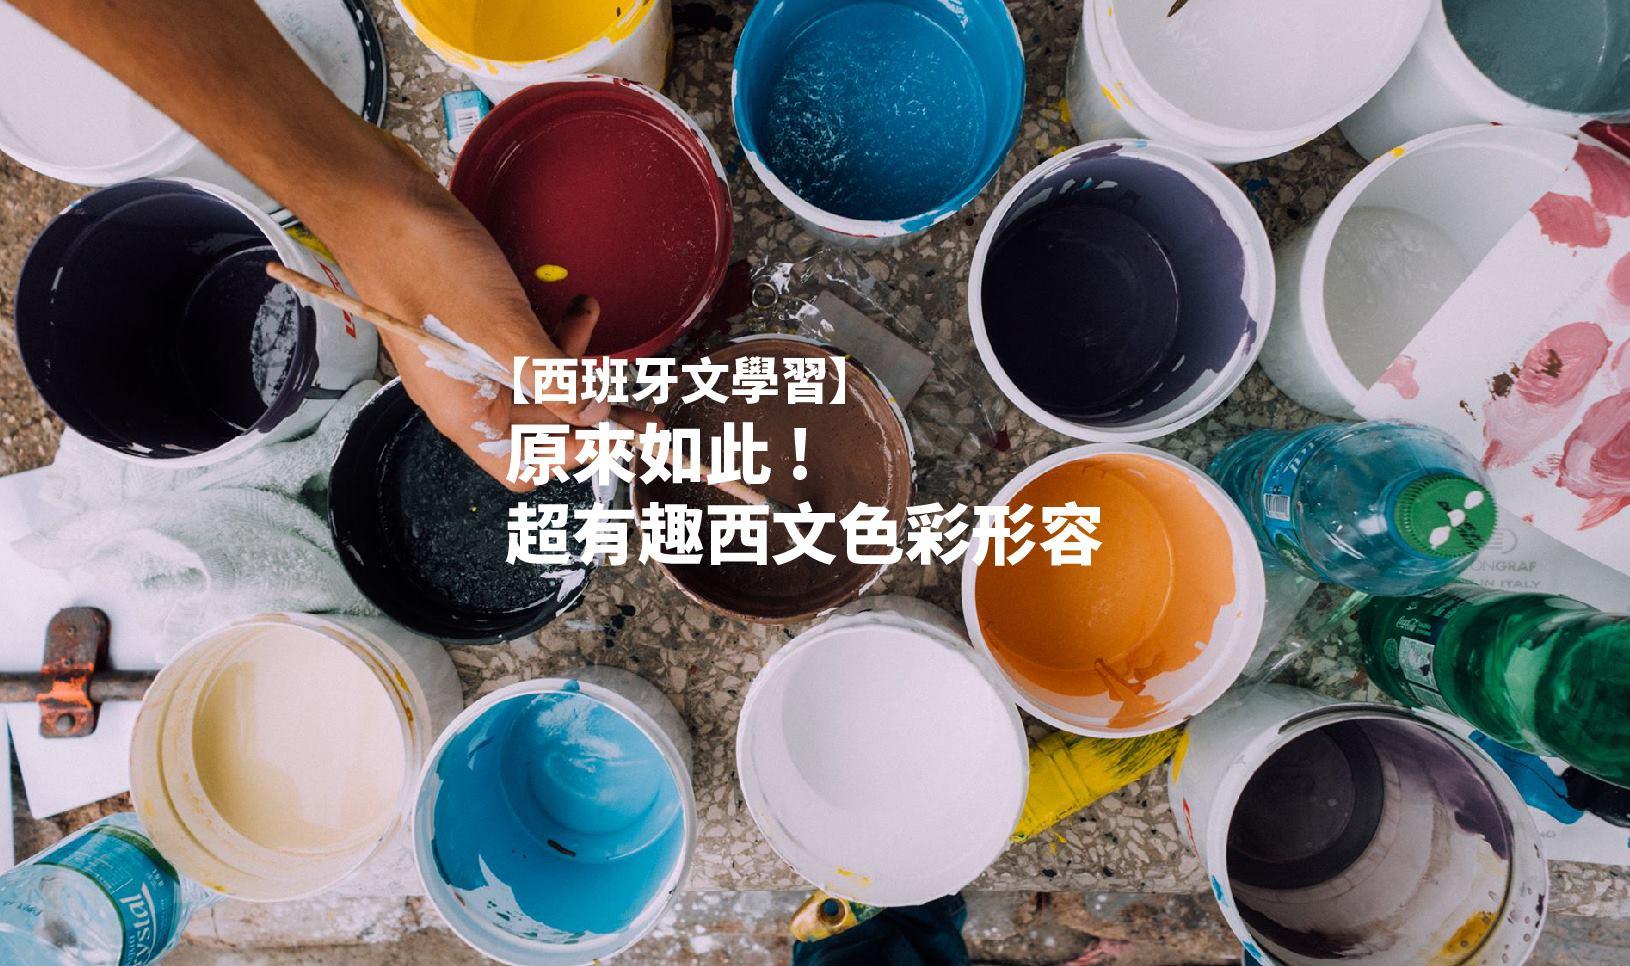 17622972_1754911357858437_2081432375_o.jpg